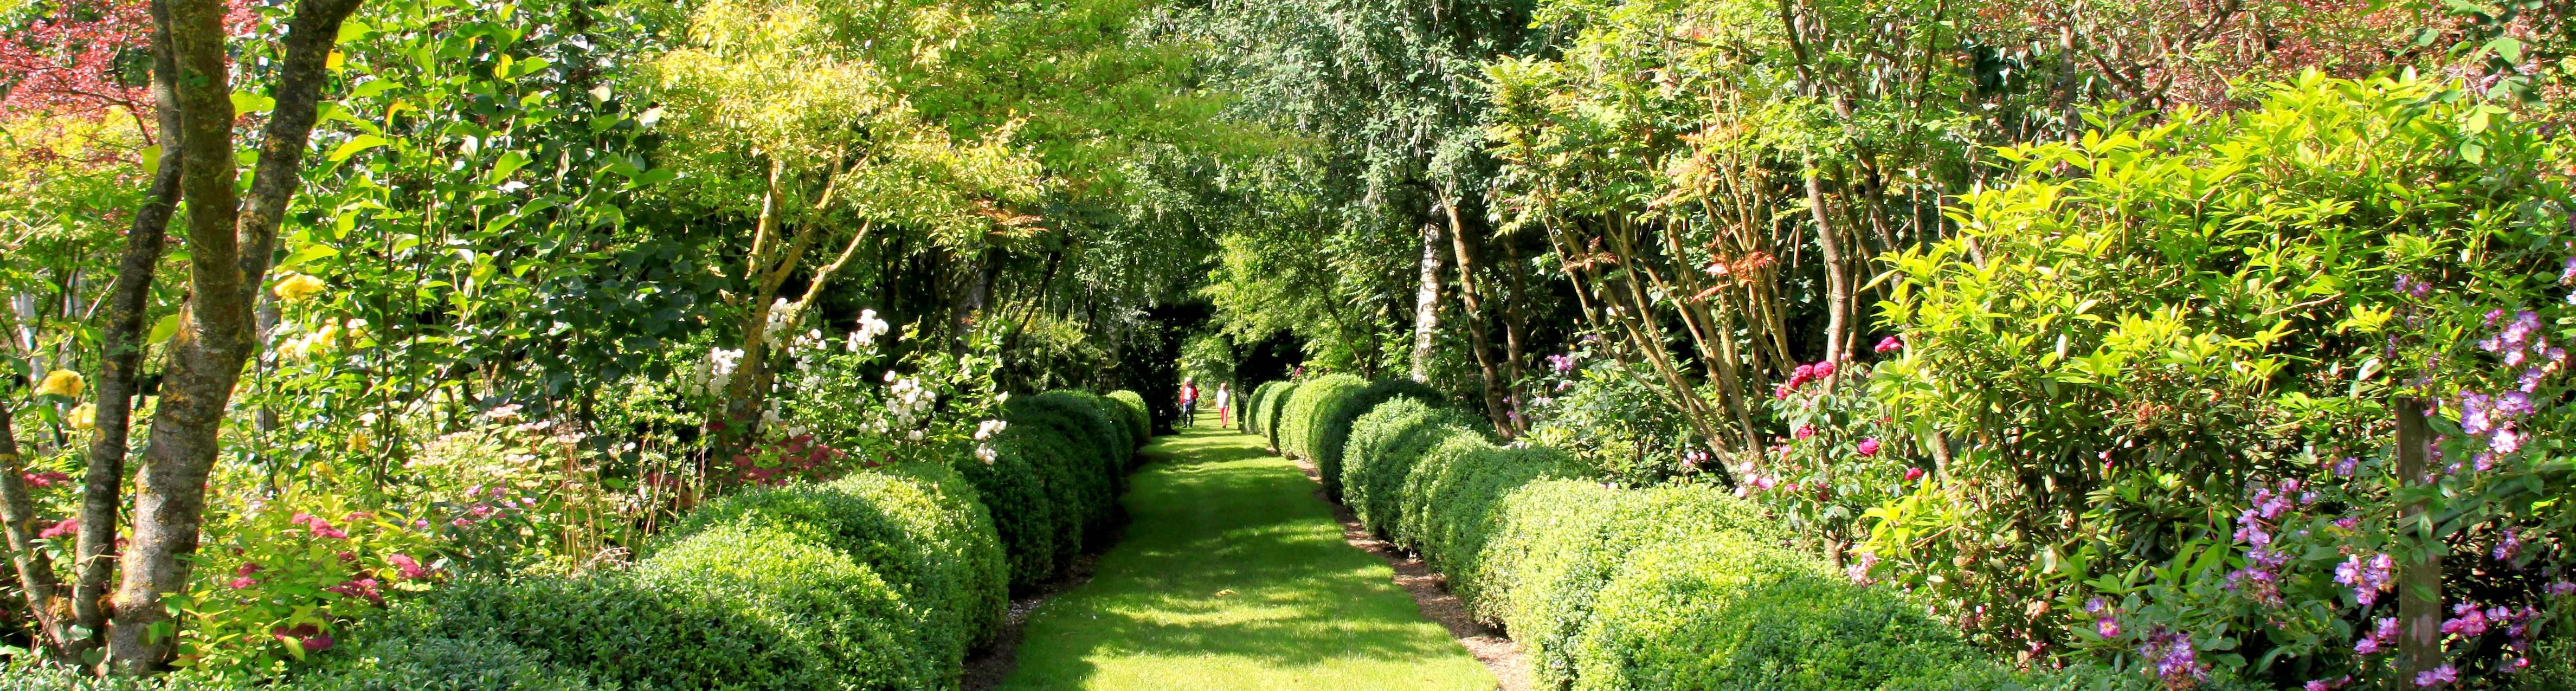 banniere-jardin-de-maizicourt